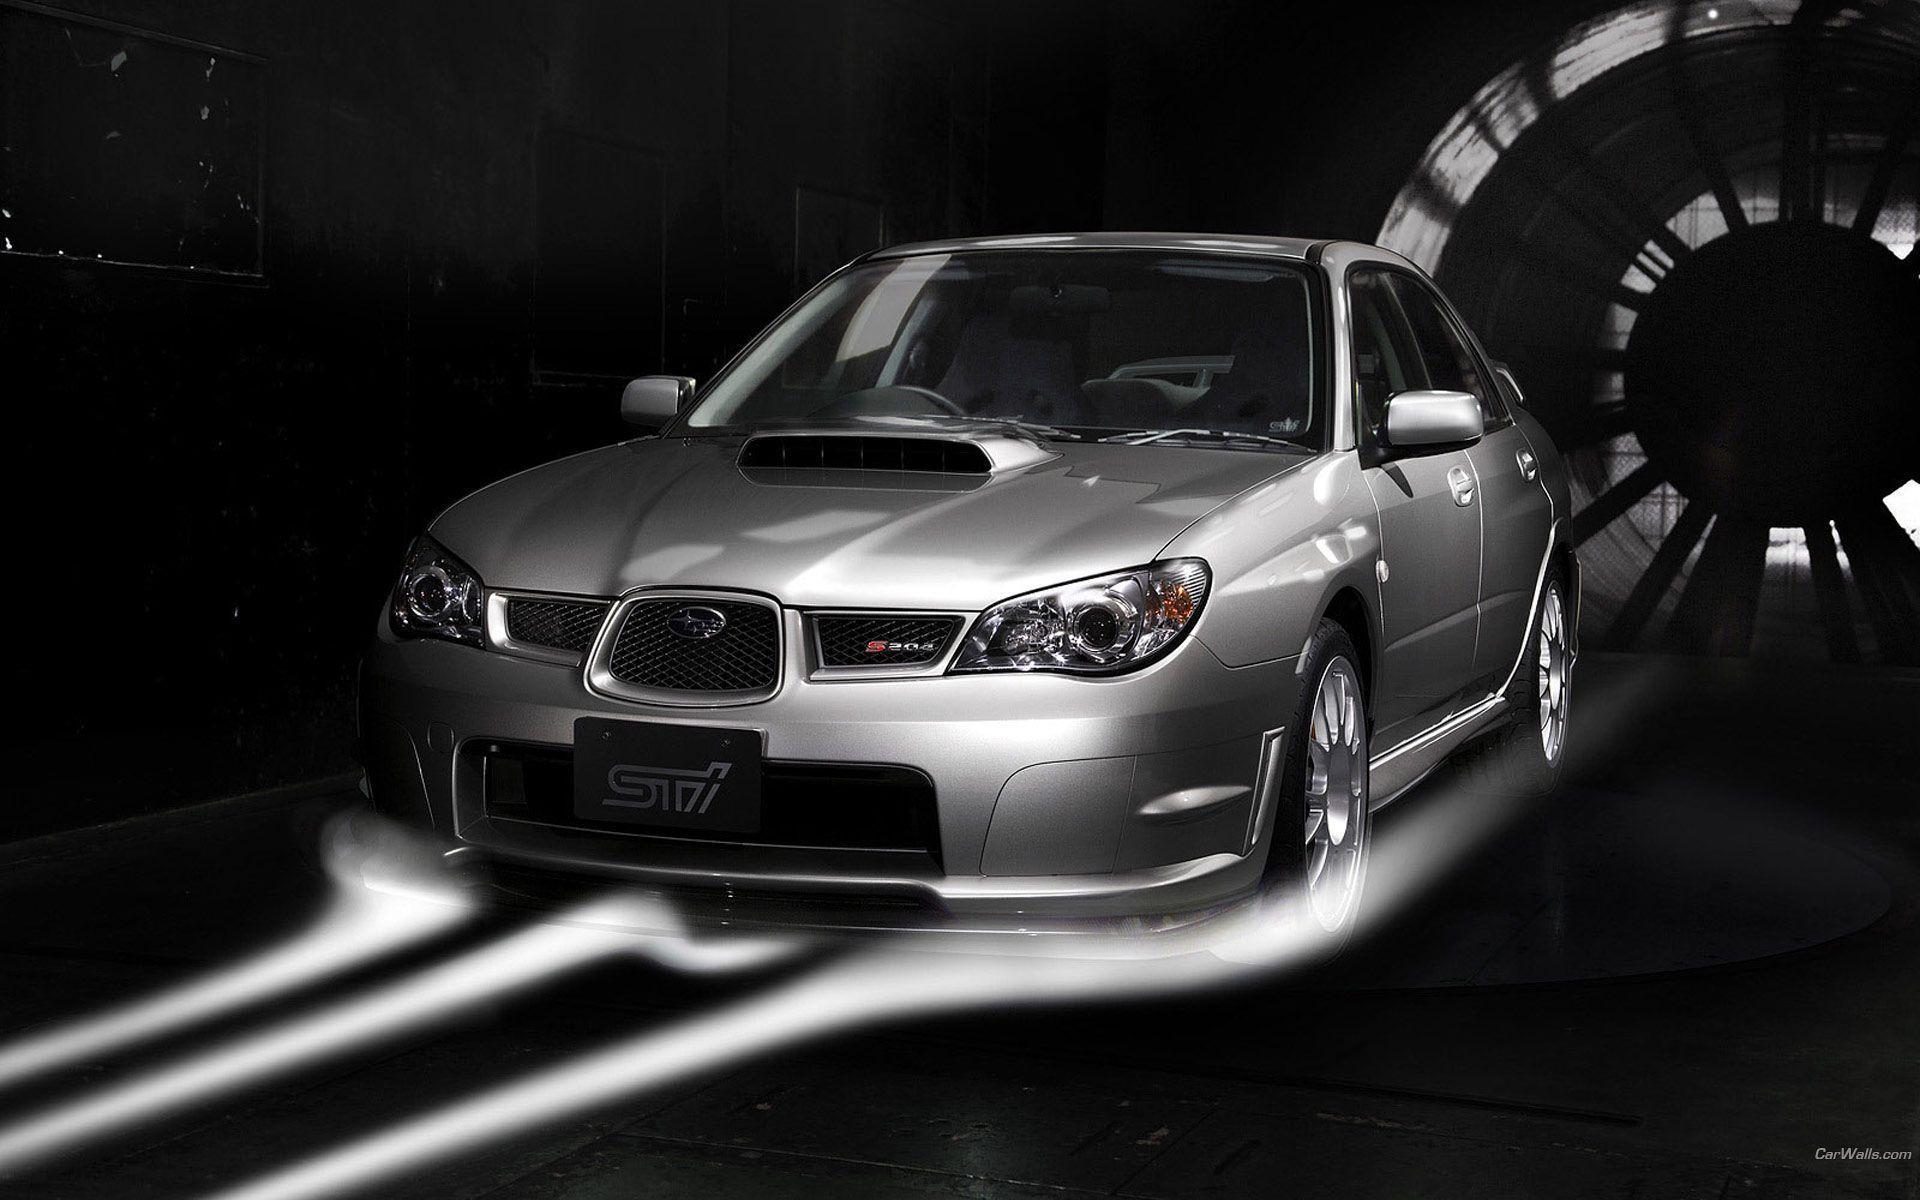 Subaru Impreza Wrx Sti Hatchback wallpaper - 315096